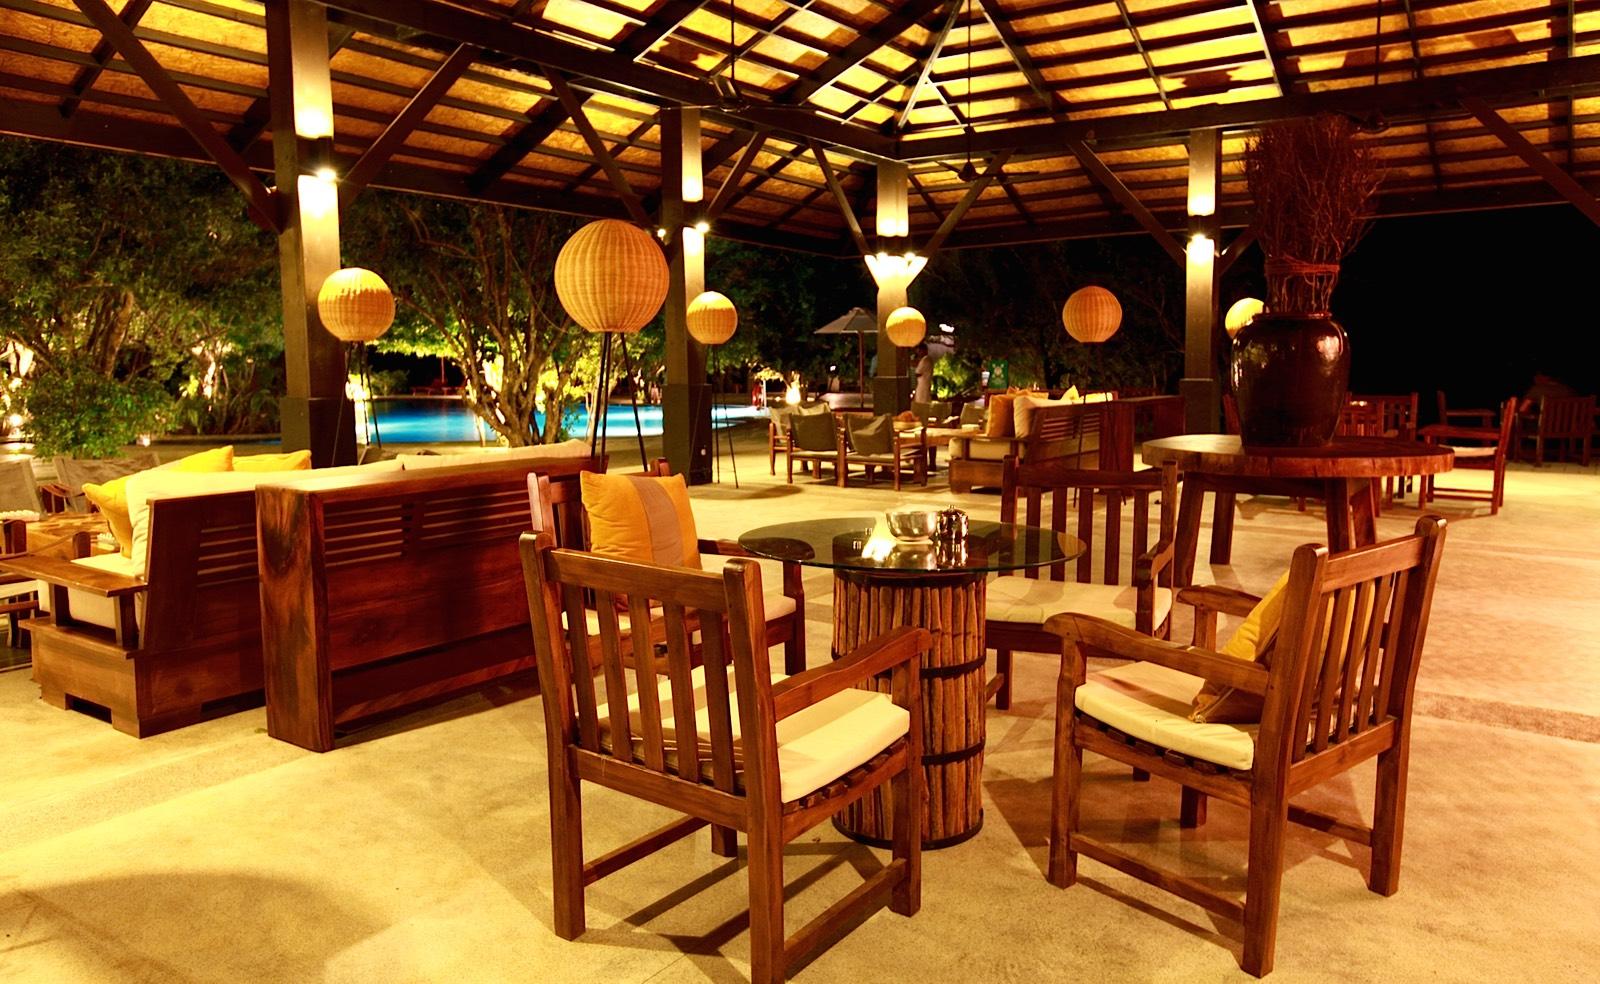 invite-to-paradise-holiday-honeymoon-sri-lanka-specialists-safari-lodge-cinnamon-wild-hotel-5.jpg